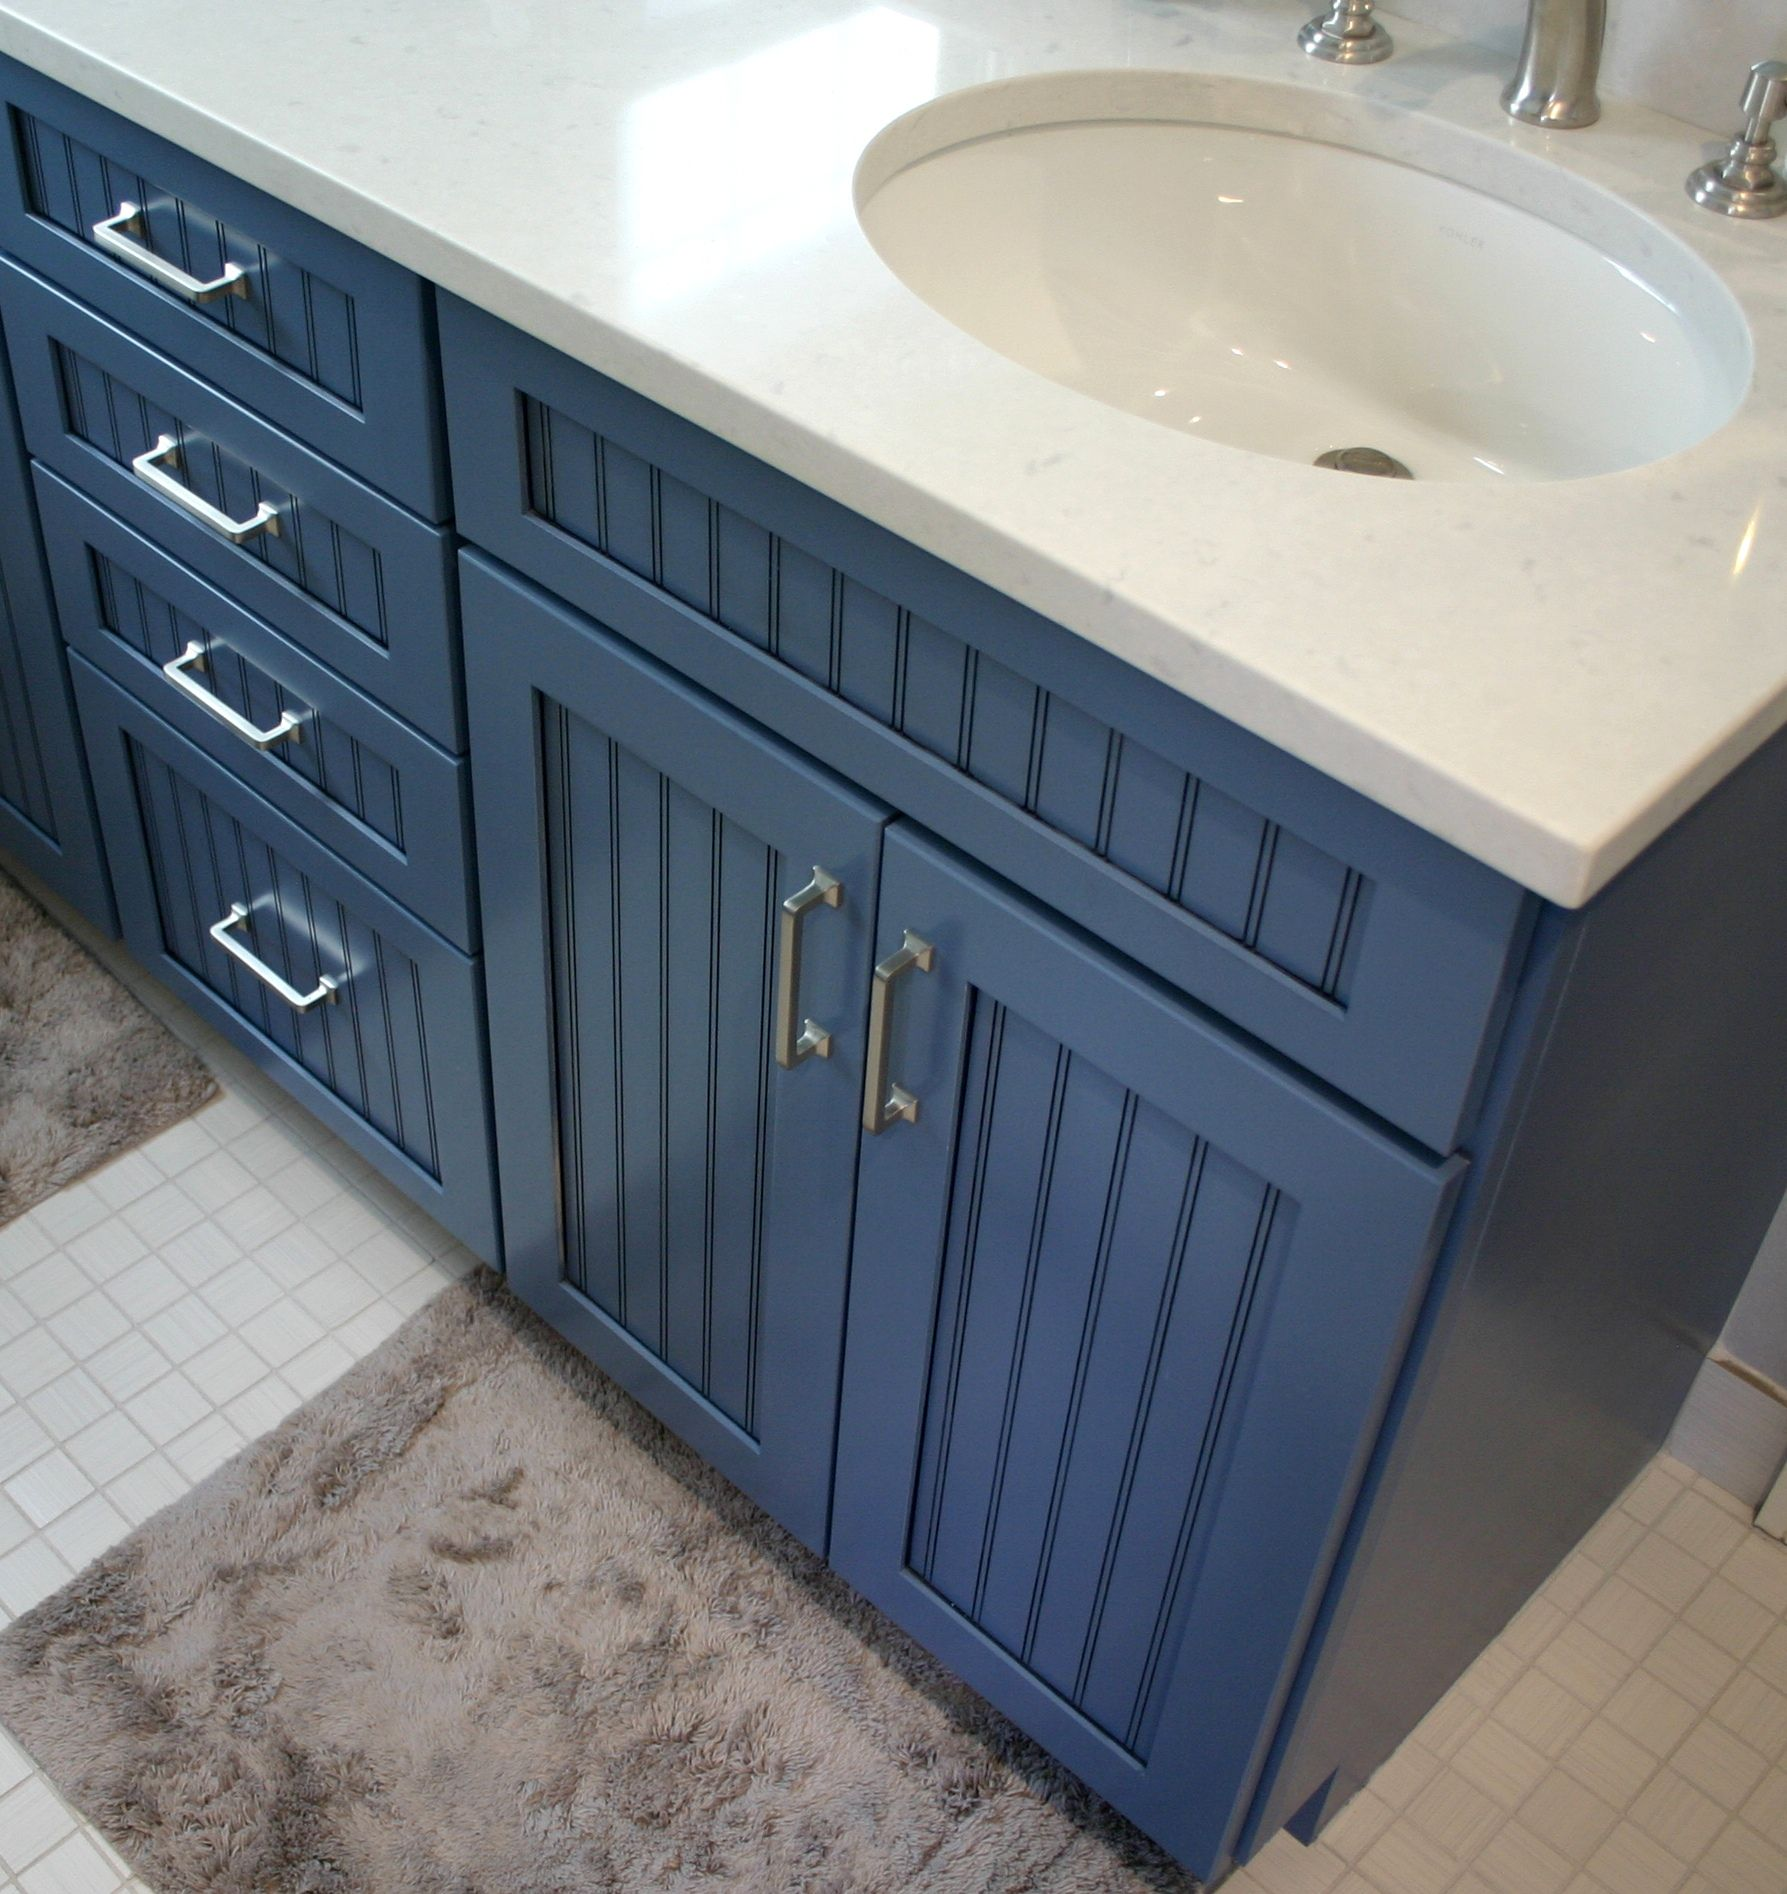 Bathroom Countertops Denver: BKC Kitchen And Bath Denver Bath Remodel: Mid Continent